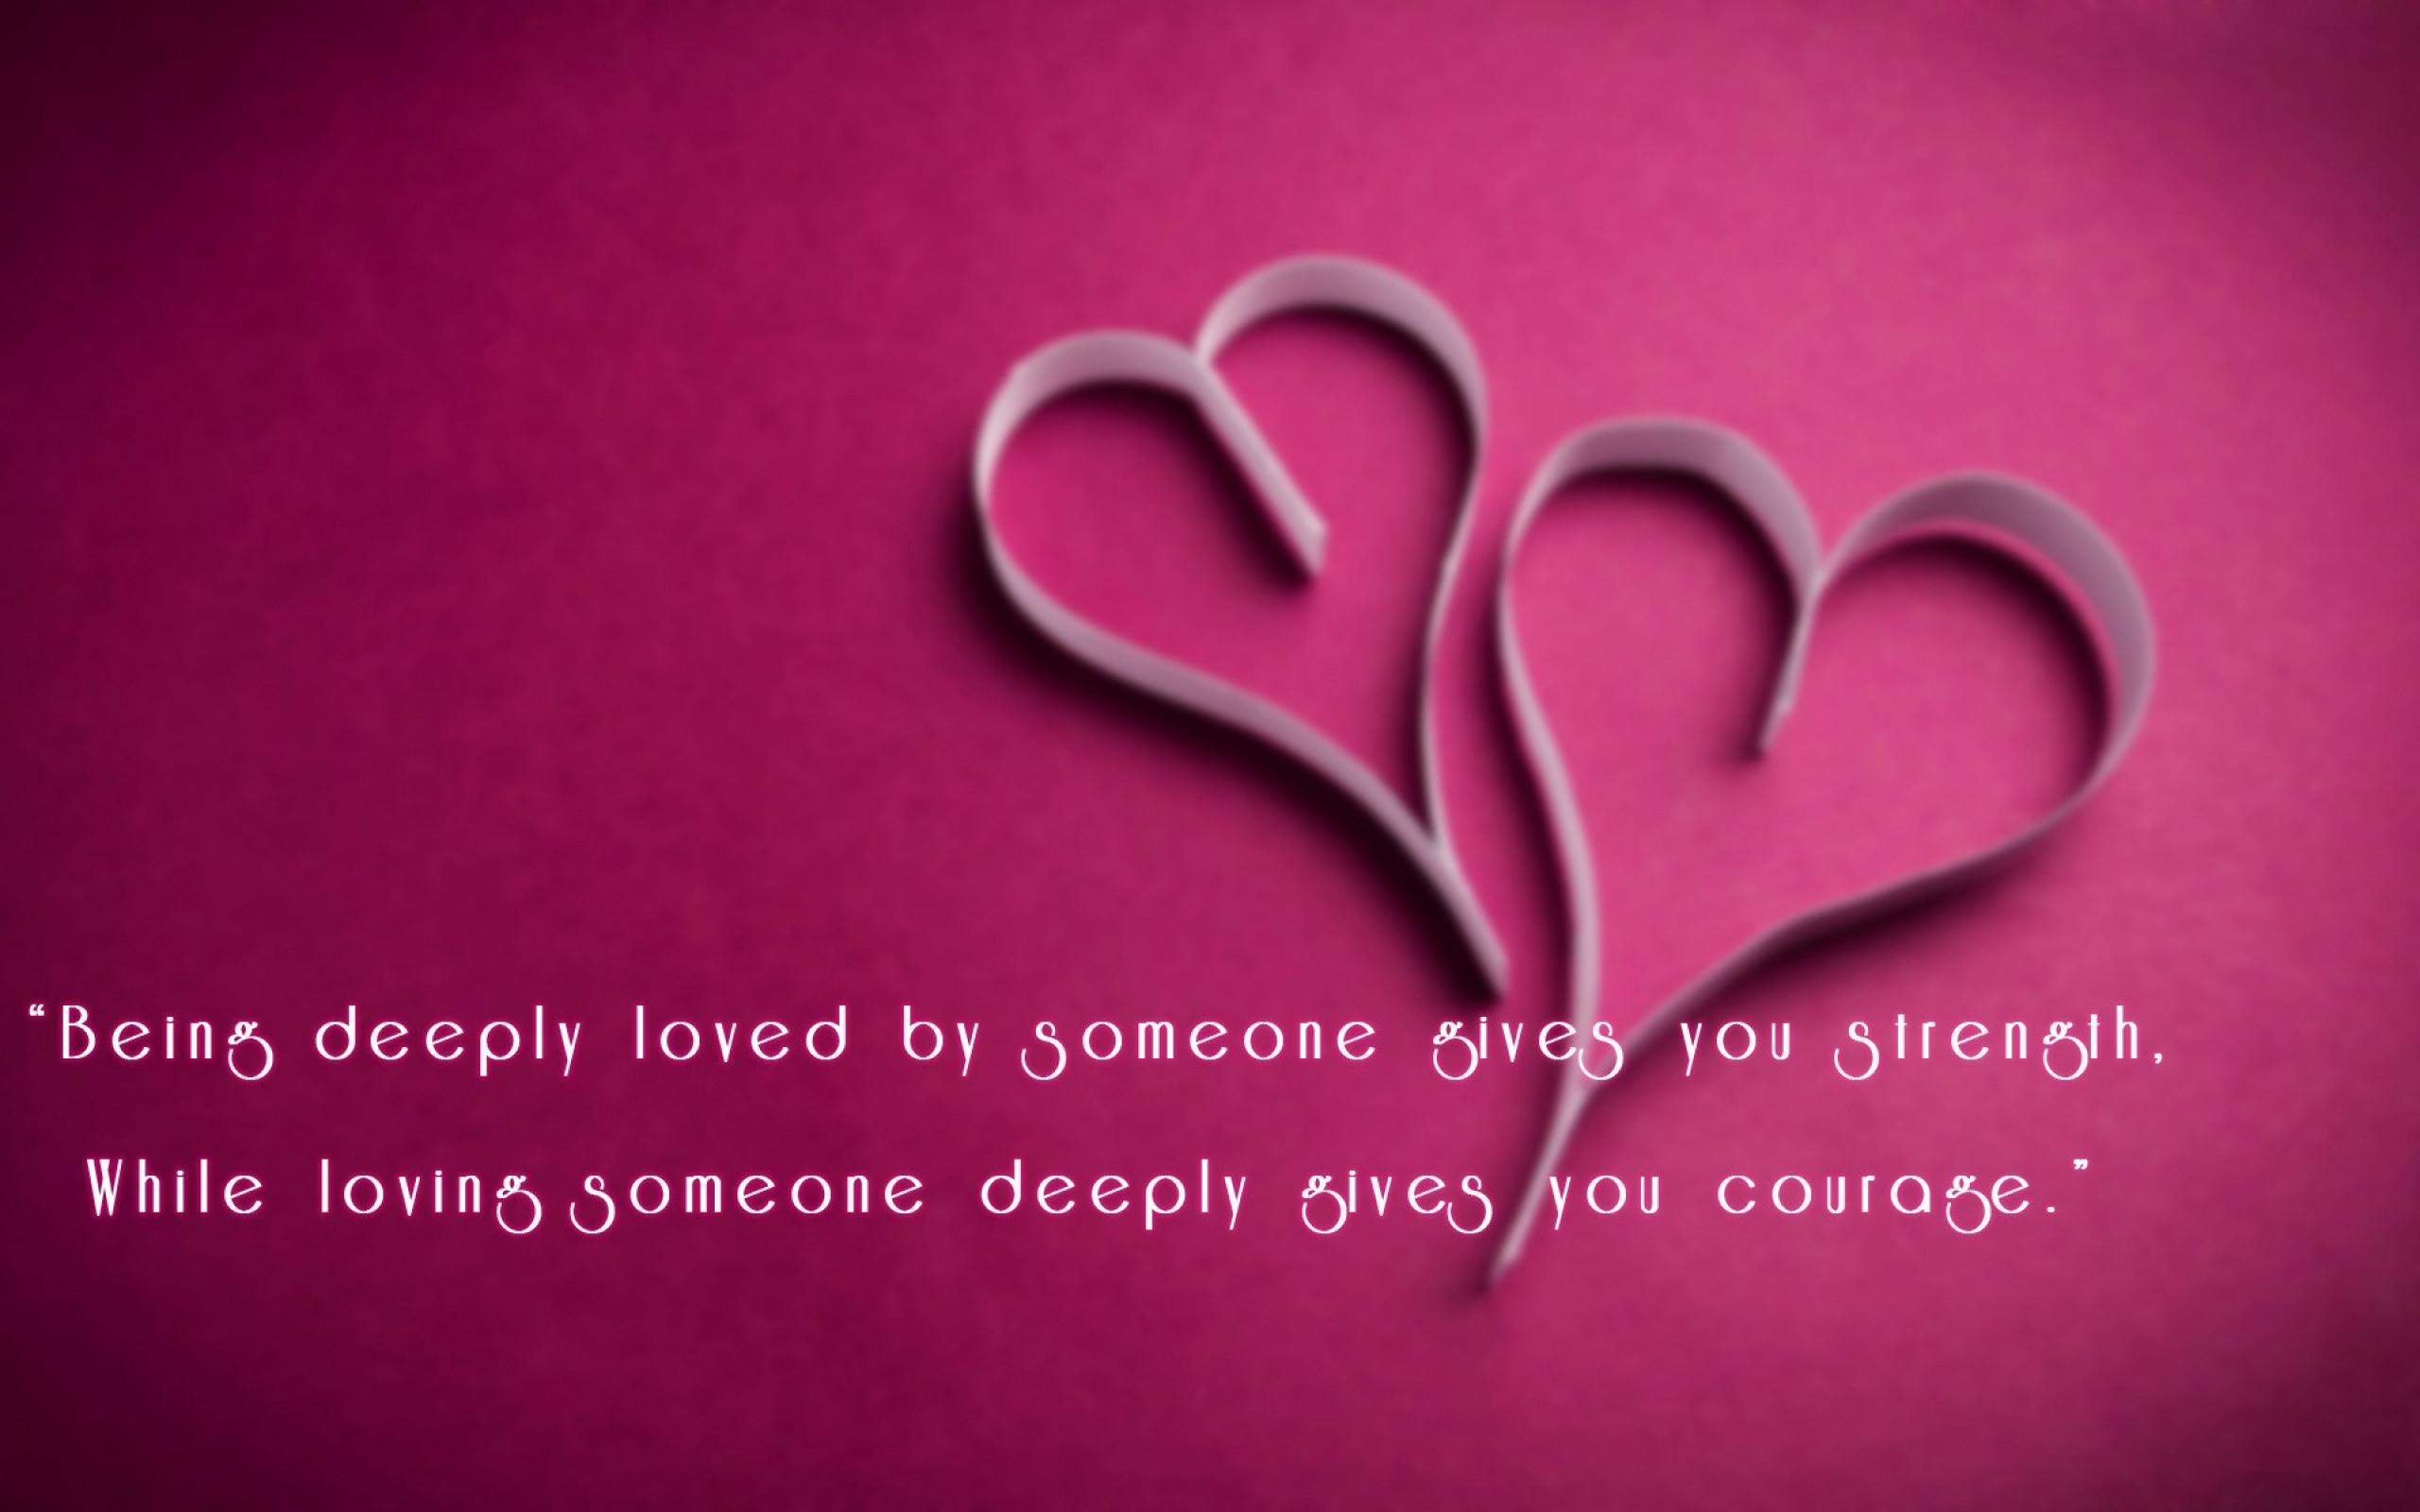 Love quotes desktop quotesgram - Cool love images ...